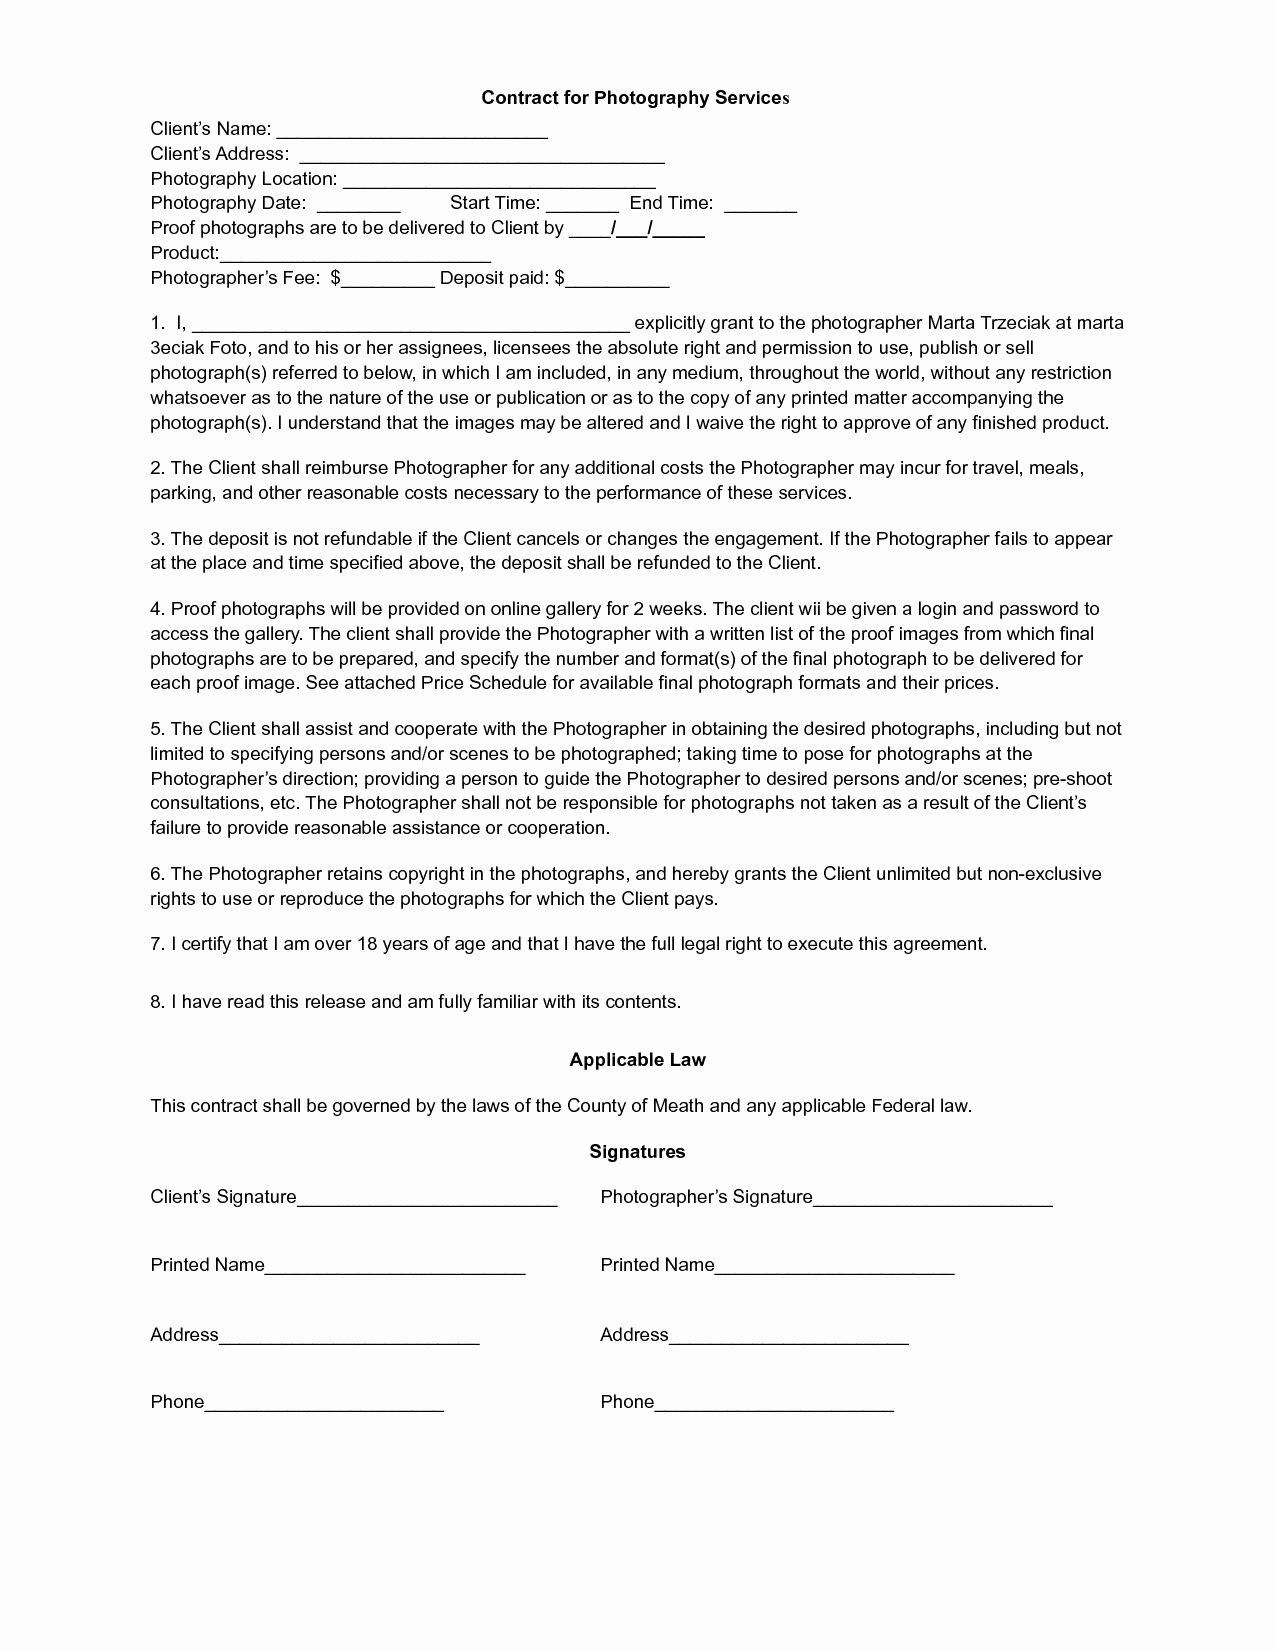 Free Hipaa Business Associate Agreement Form – Guiaubuntupt Pertaining To Free Hipaa Business Associate Agreement Template 2018